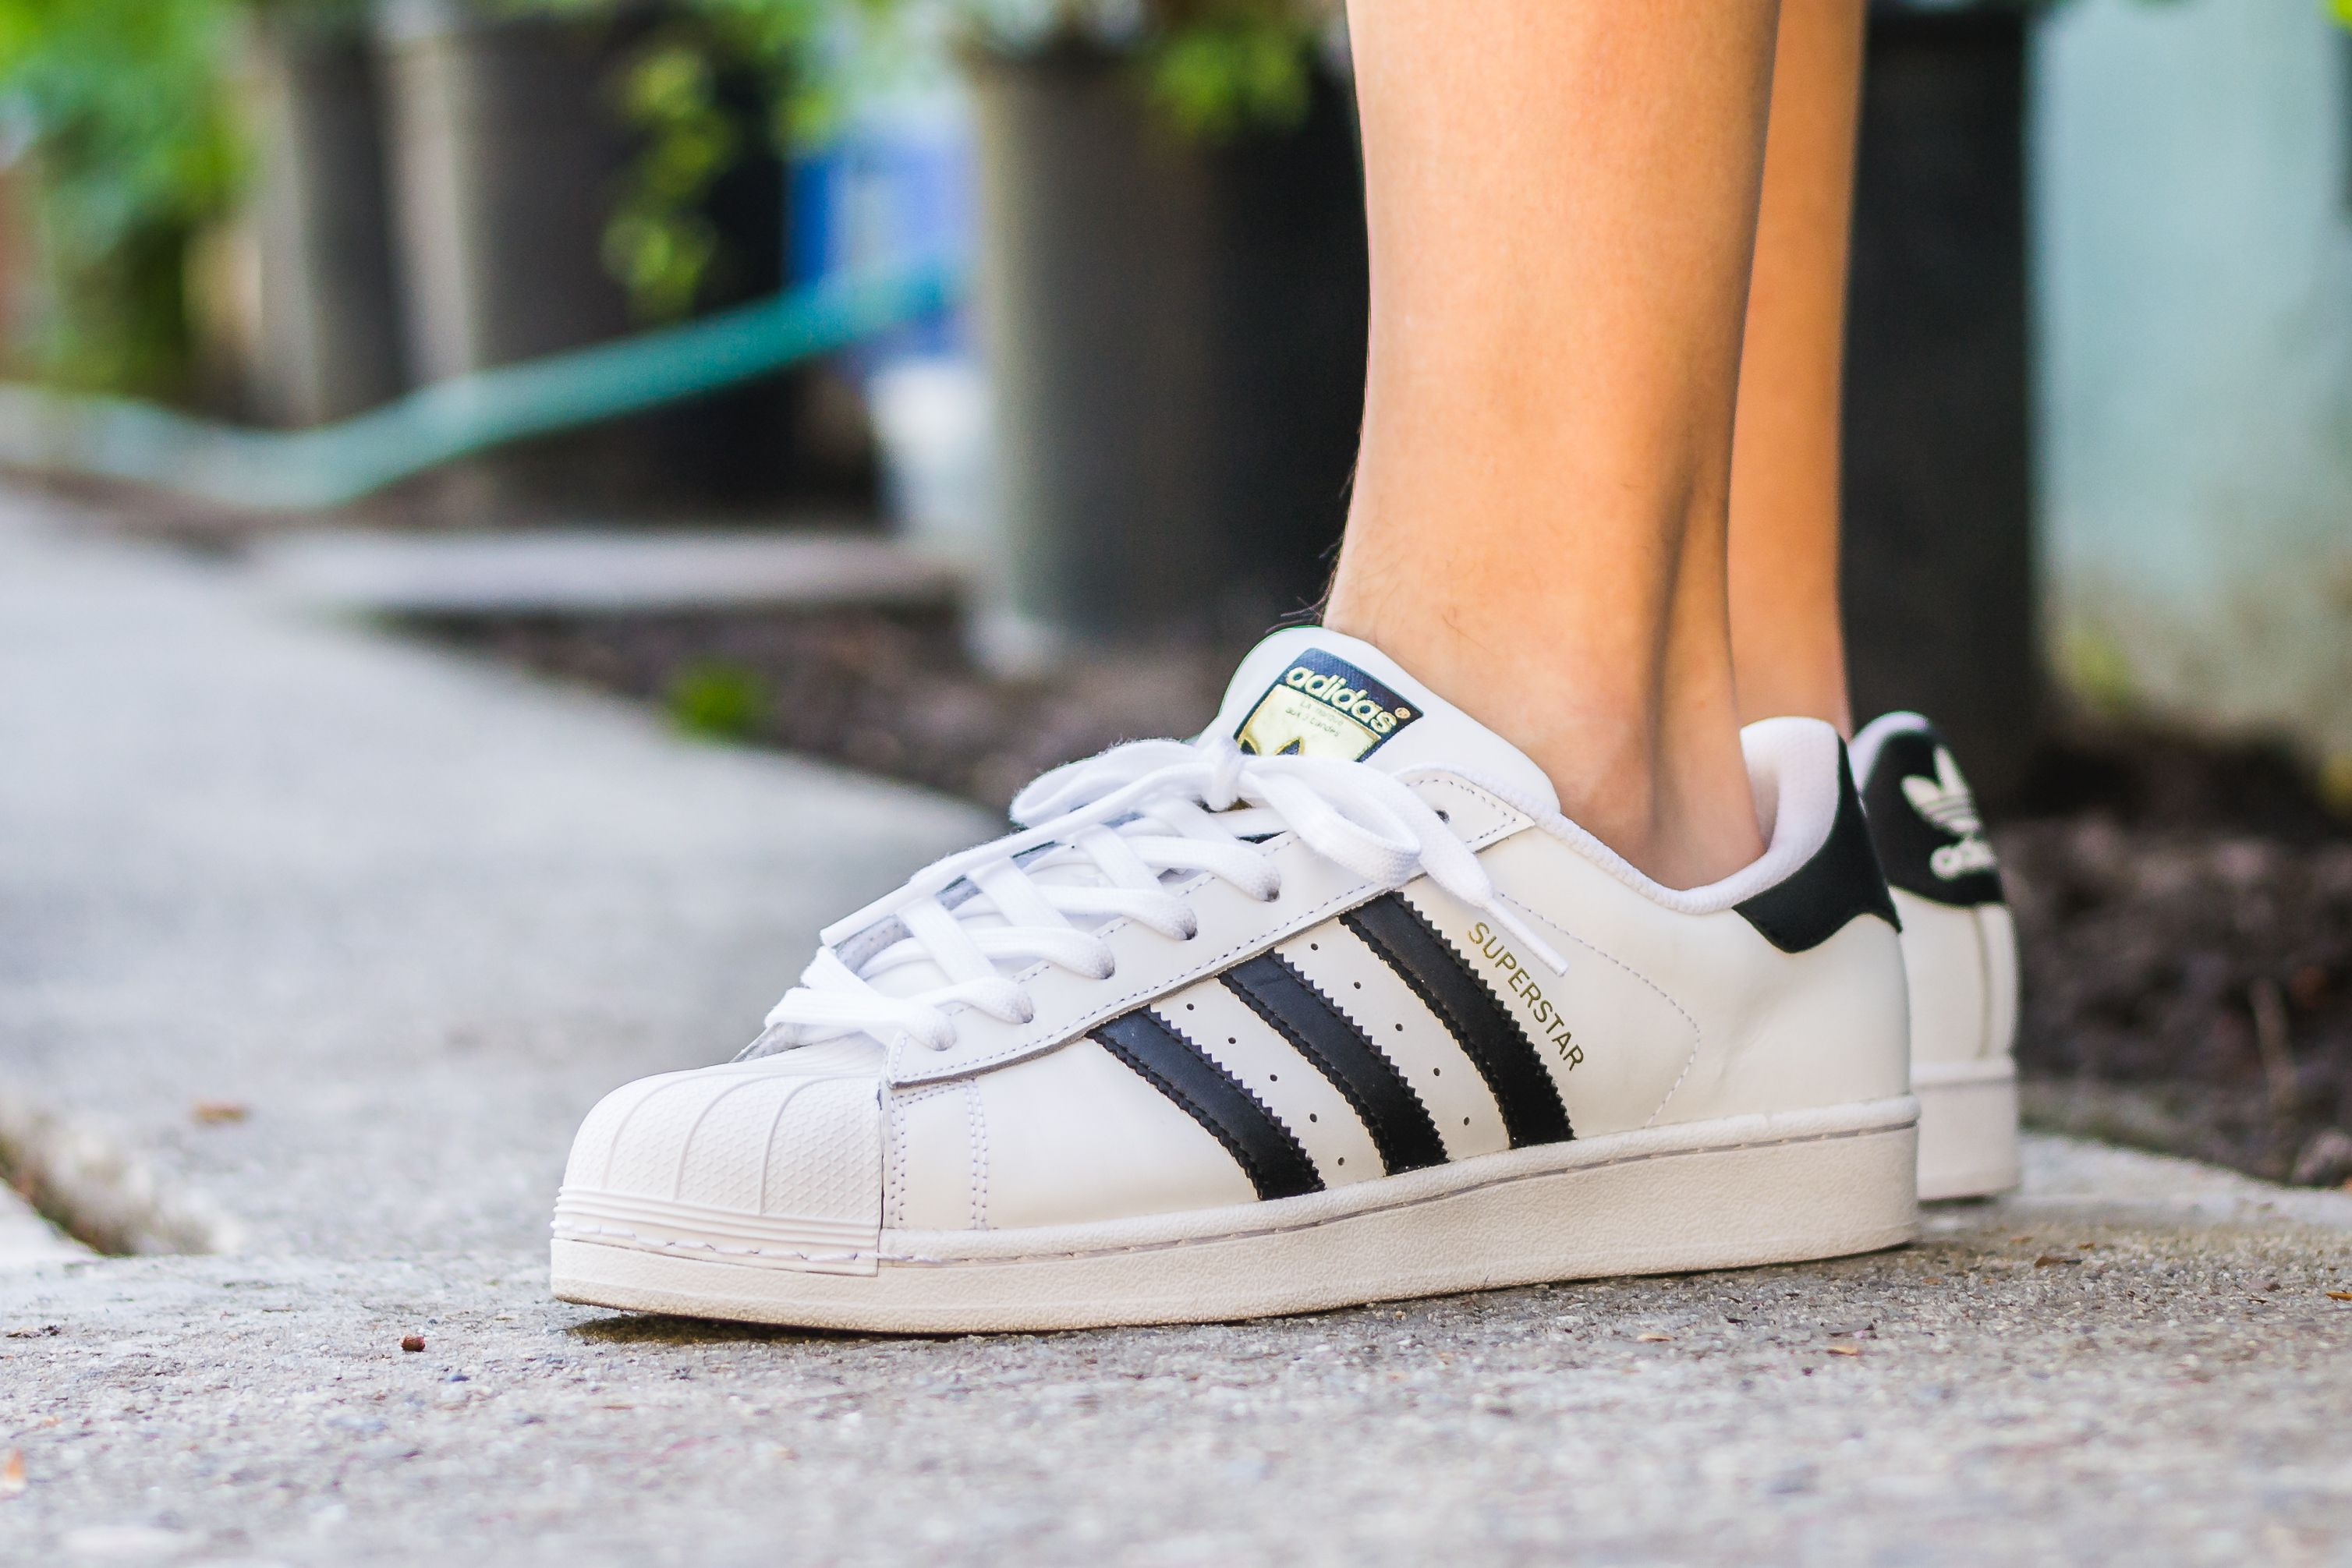 Adidas Superstar White & Black On Feet Sneaker Review